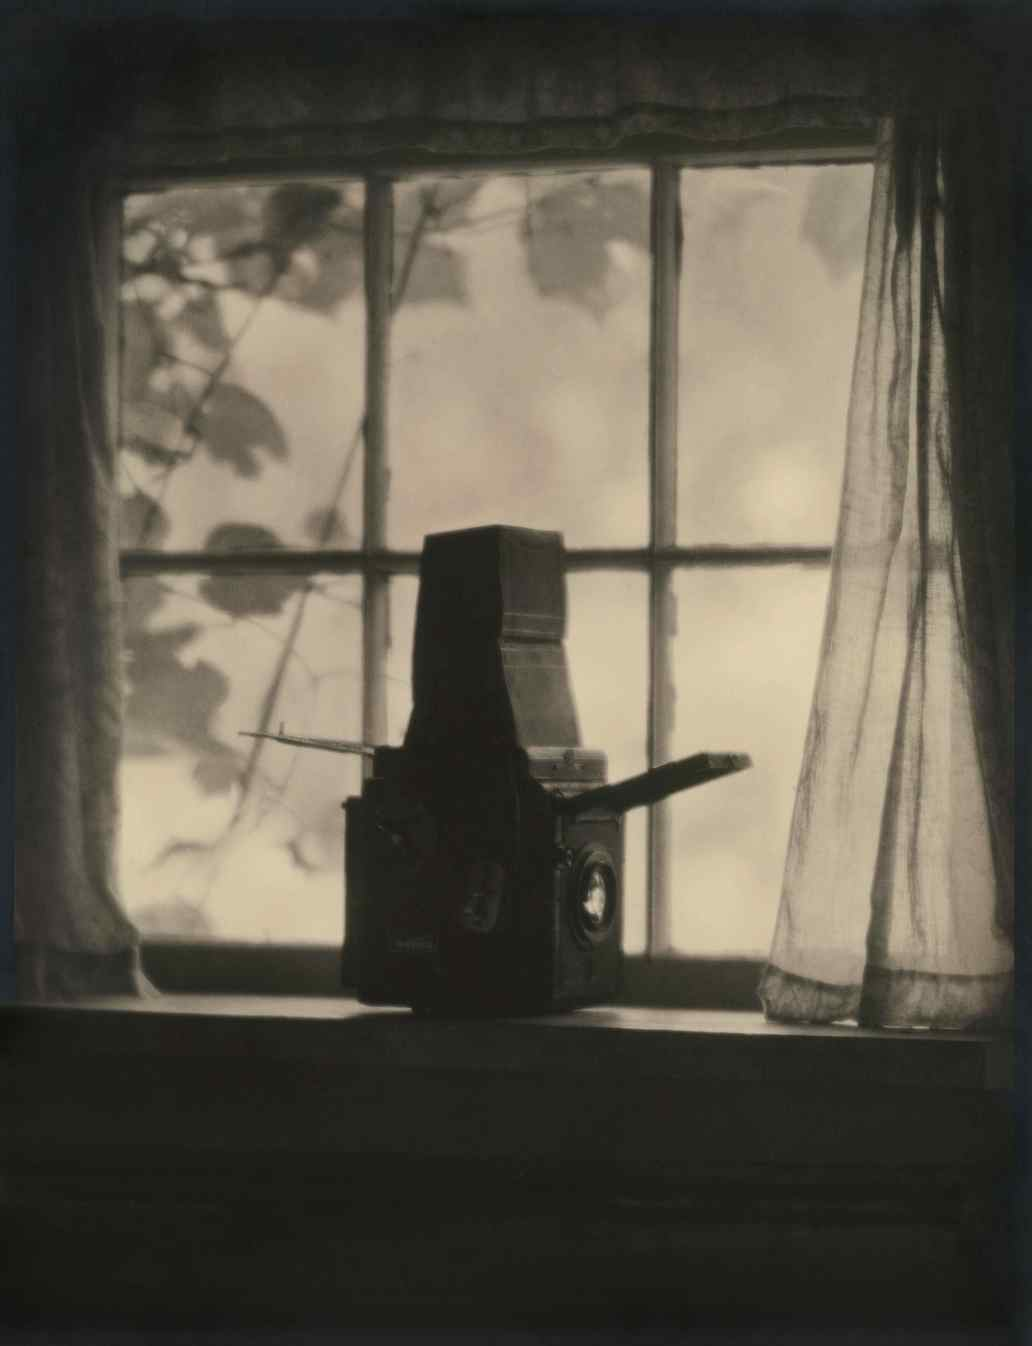 Margaret Watkins. Untitled (Graflex Camera), c. 1920 © Margaret Watkins. Joseph Mulholland Collection, Glasgow